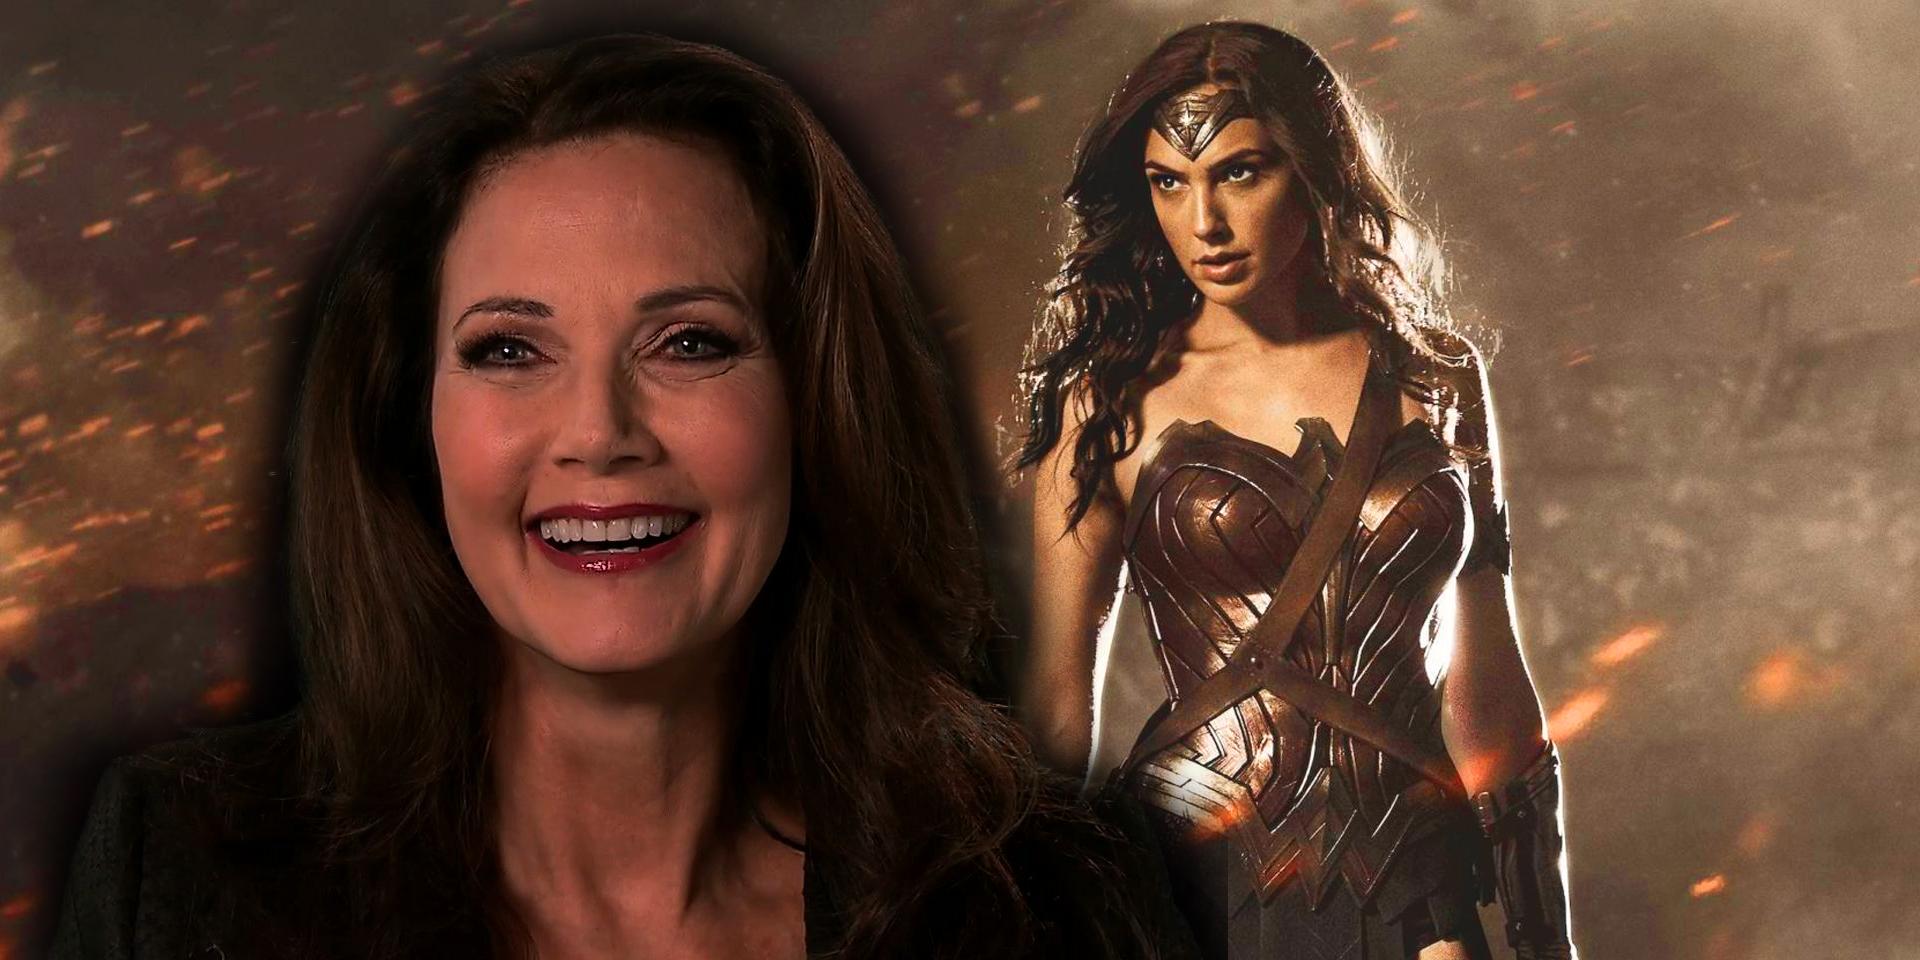 Lynda Carter headshot superimposed over an image of Gal Gadot as Wonder Woman